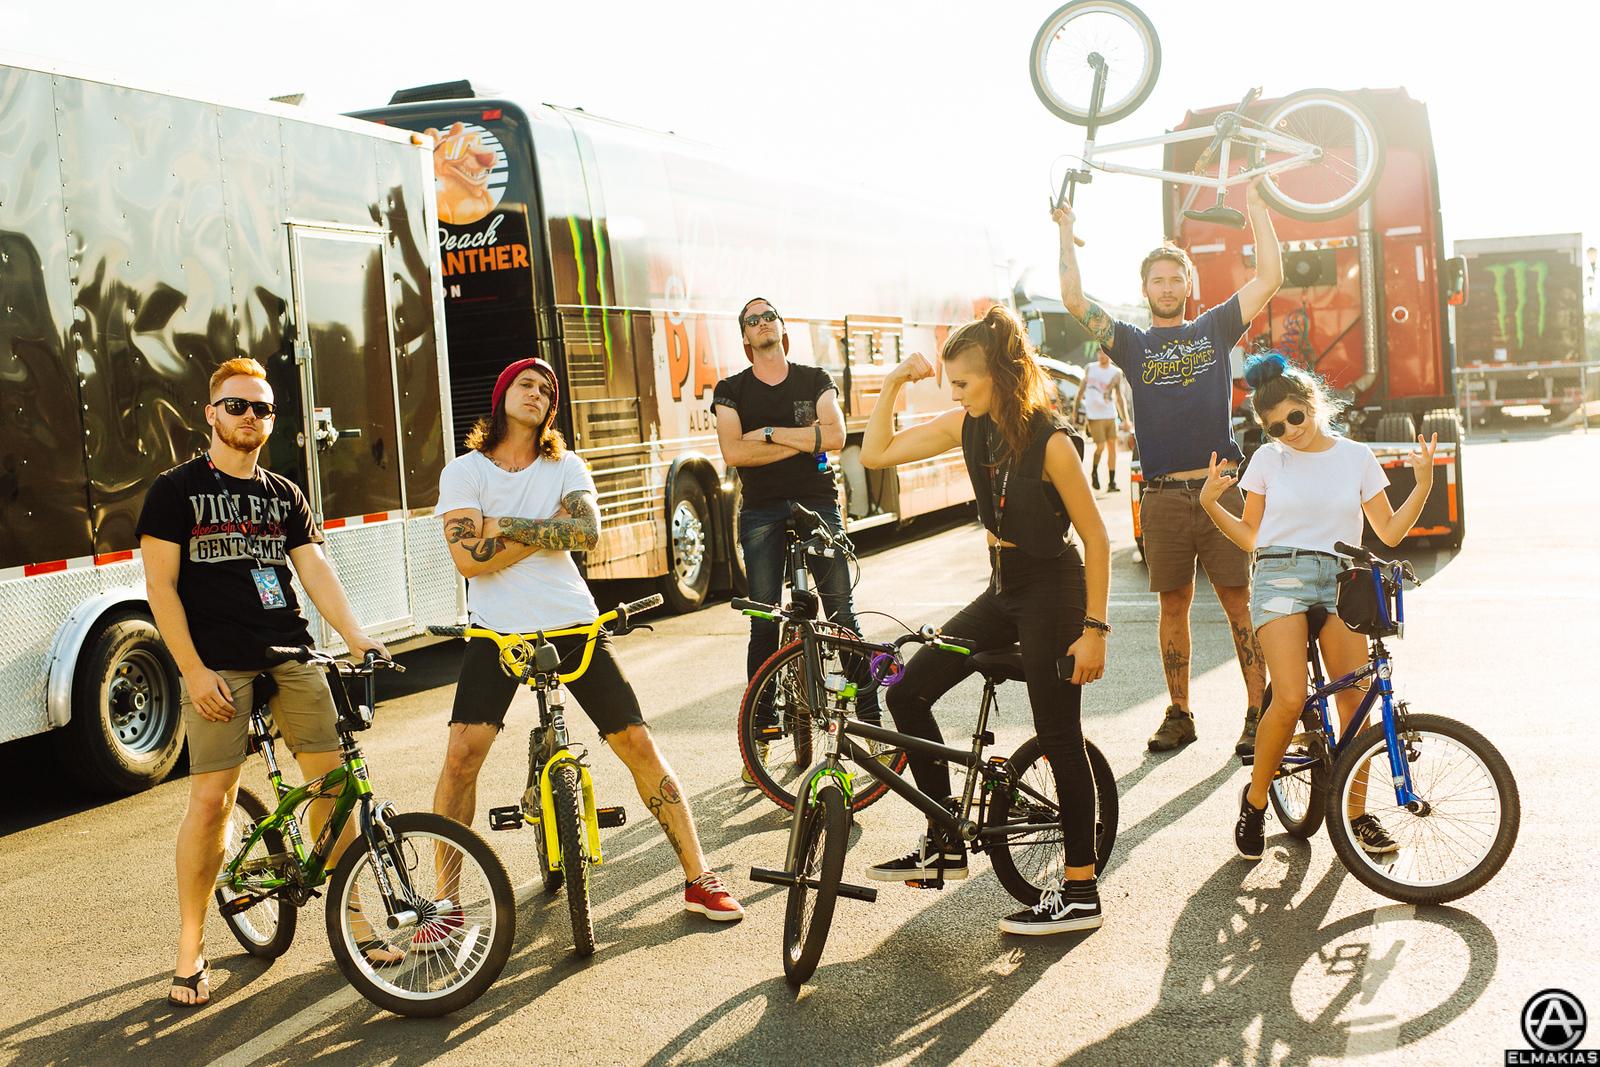 PVRIS at Vans Warped Tour 2015 by Adam Elmakias